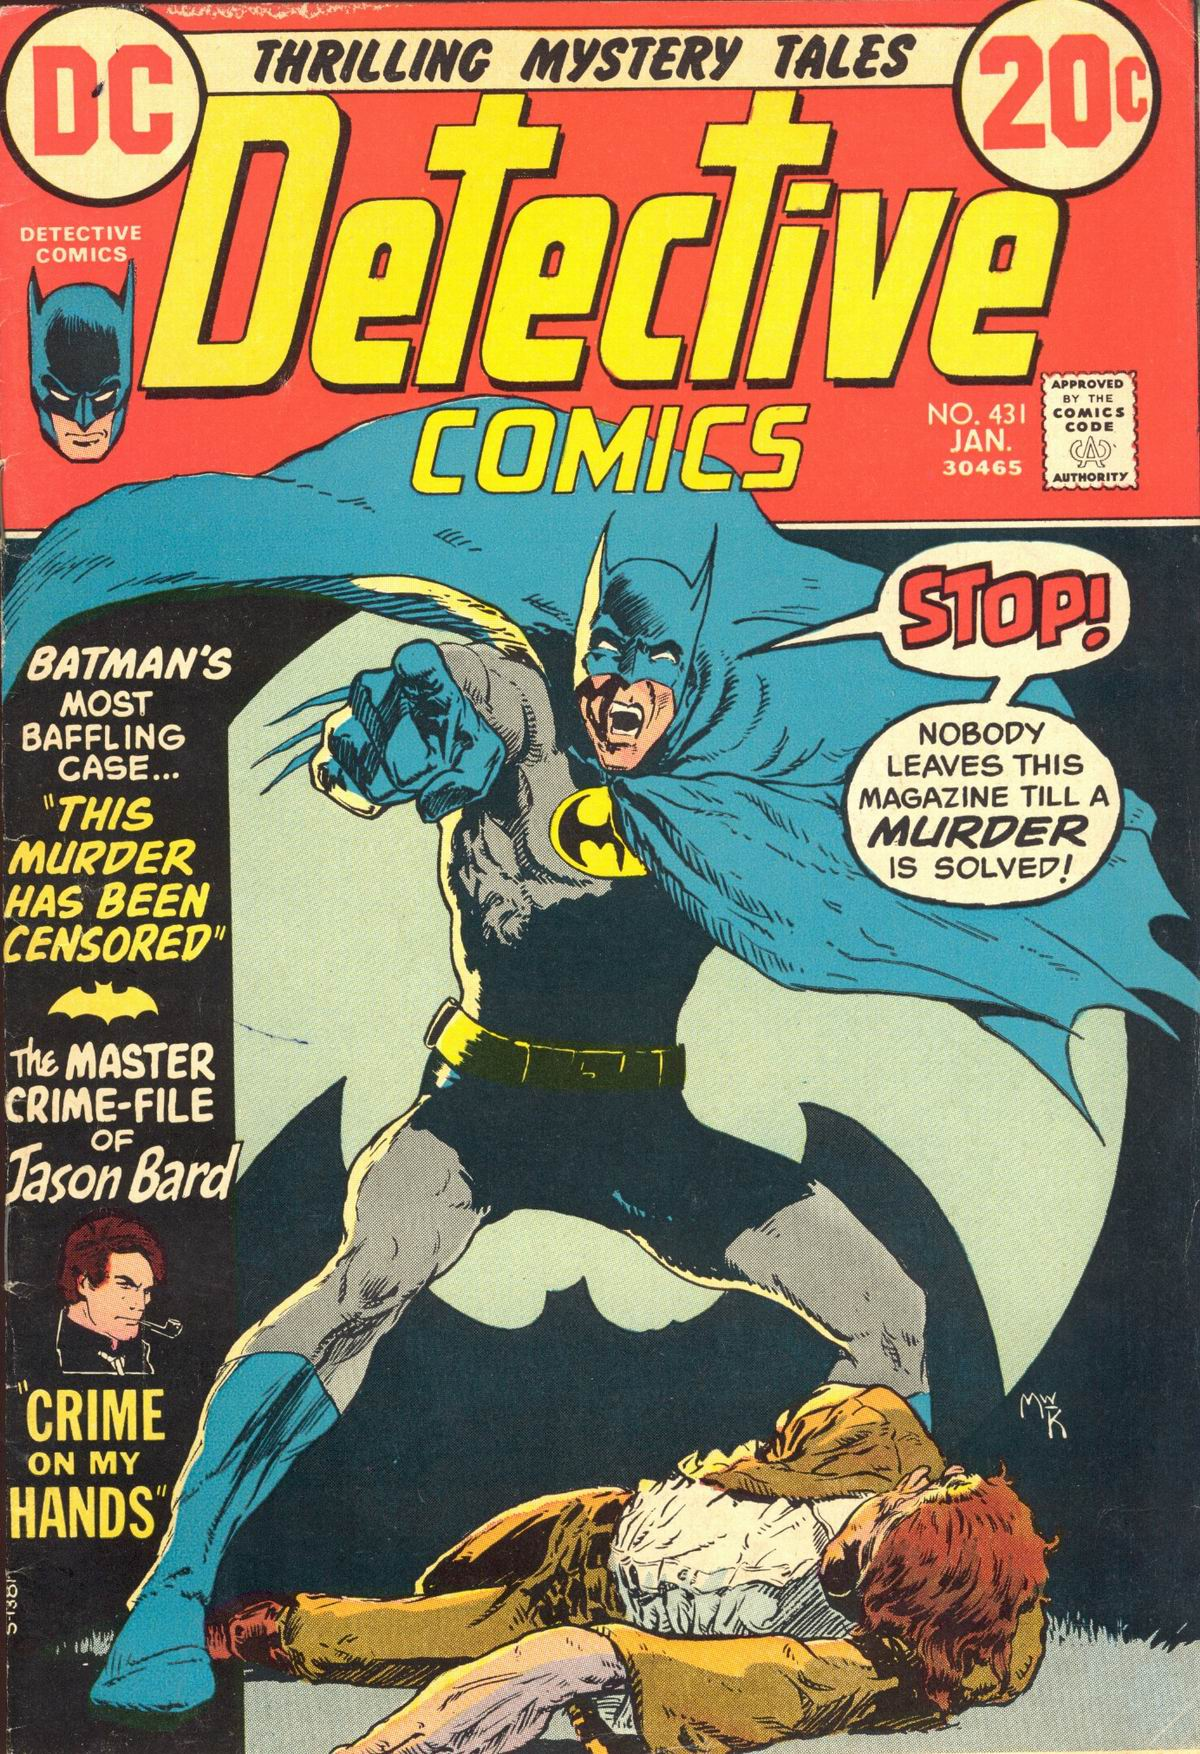 Detective Comics (1937) 431 Page 1